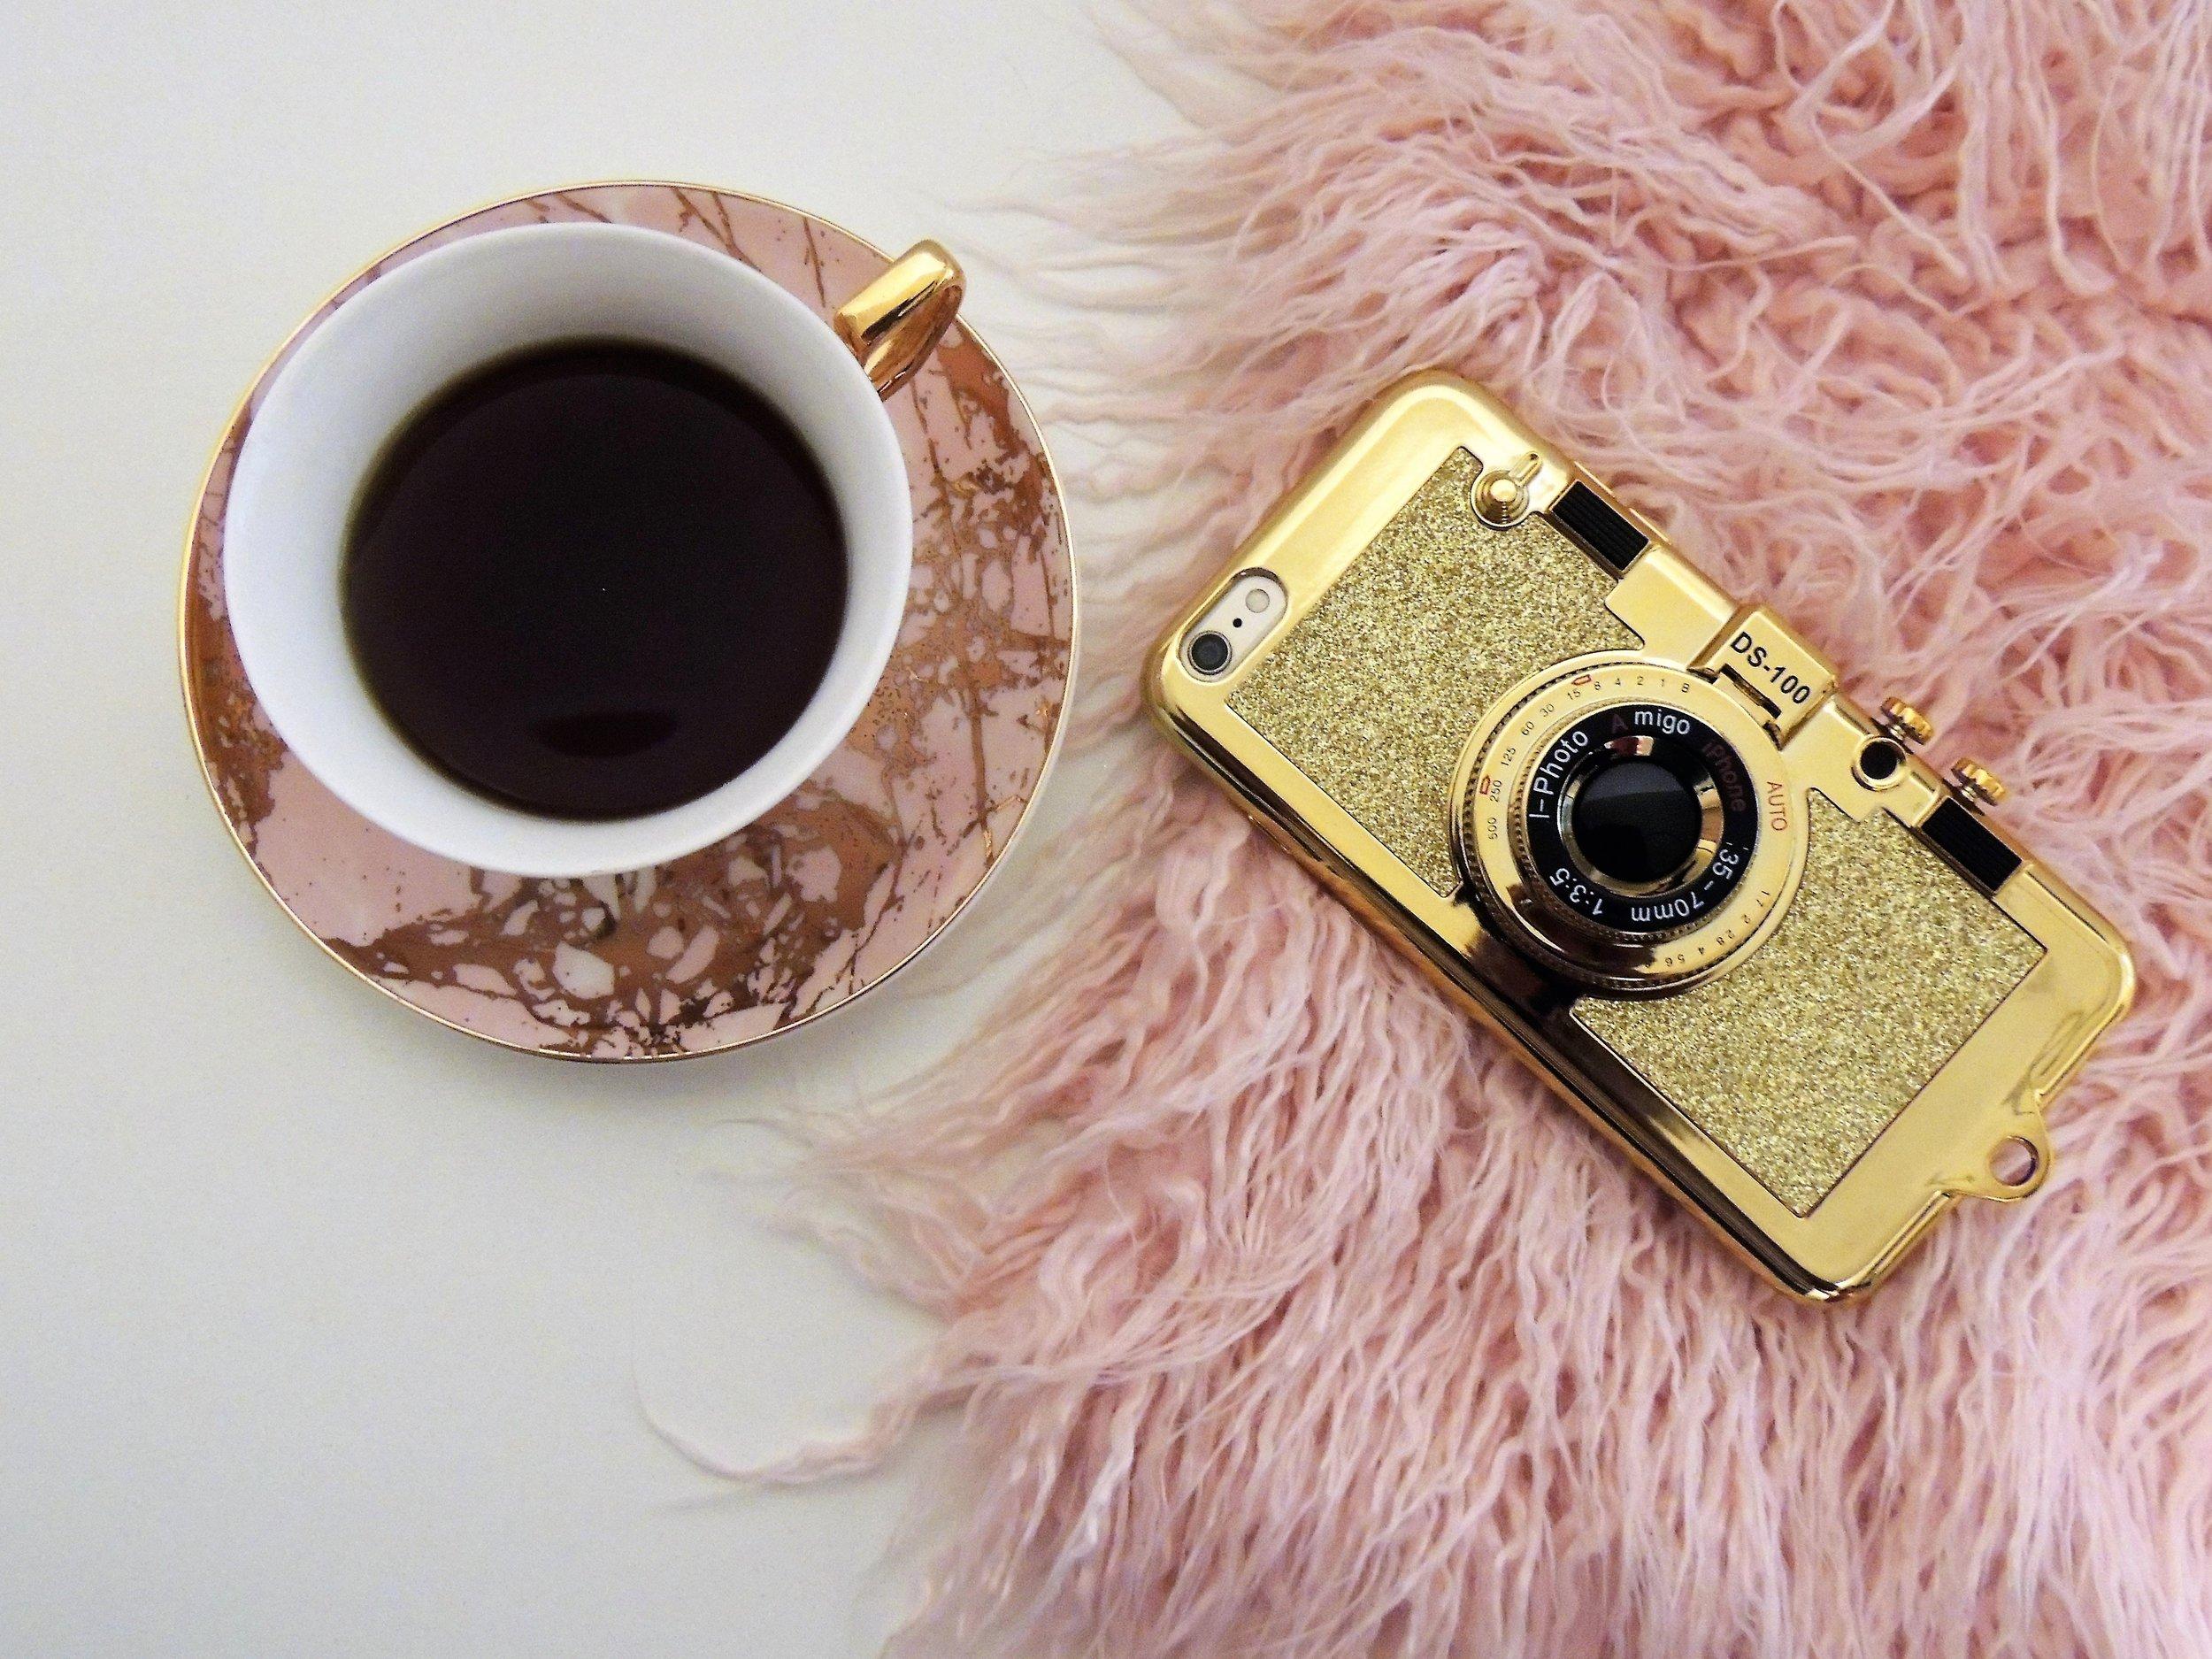 black-coffee-caffeine-coffee-915162.jpg